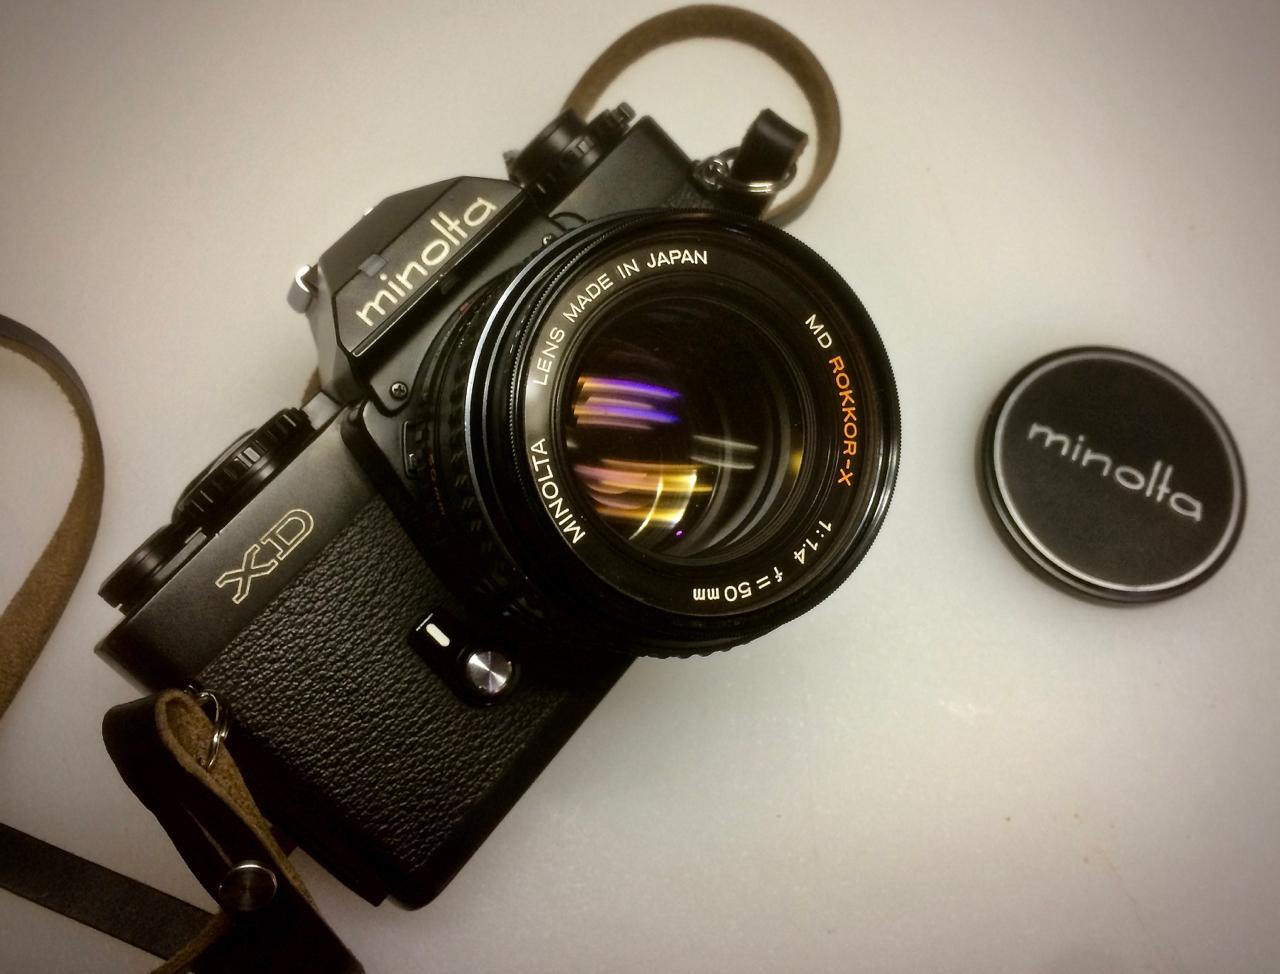 New Years Day Camera: The Minolta XD